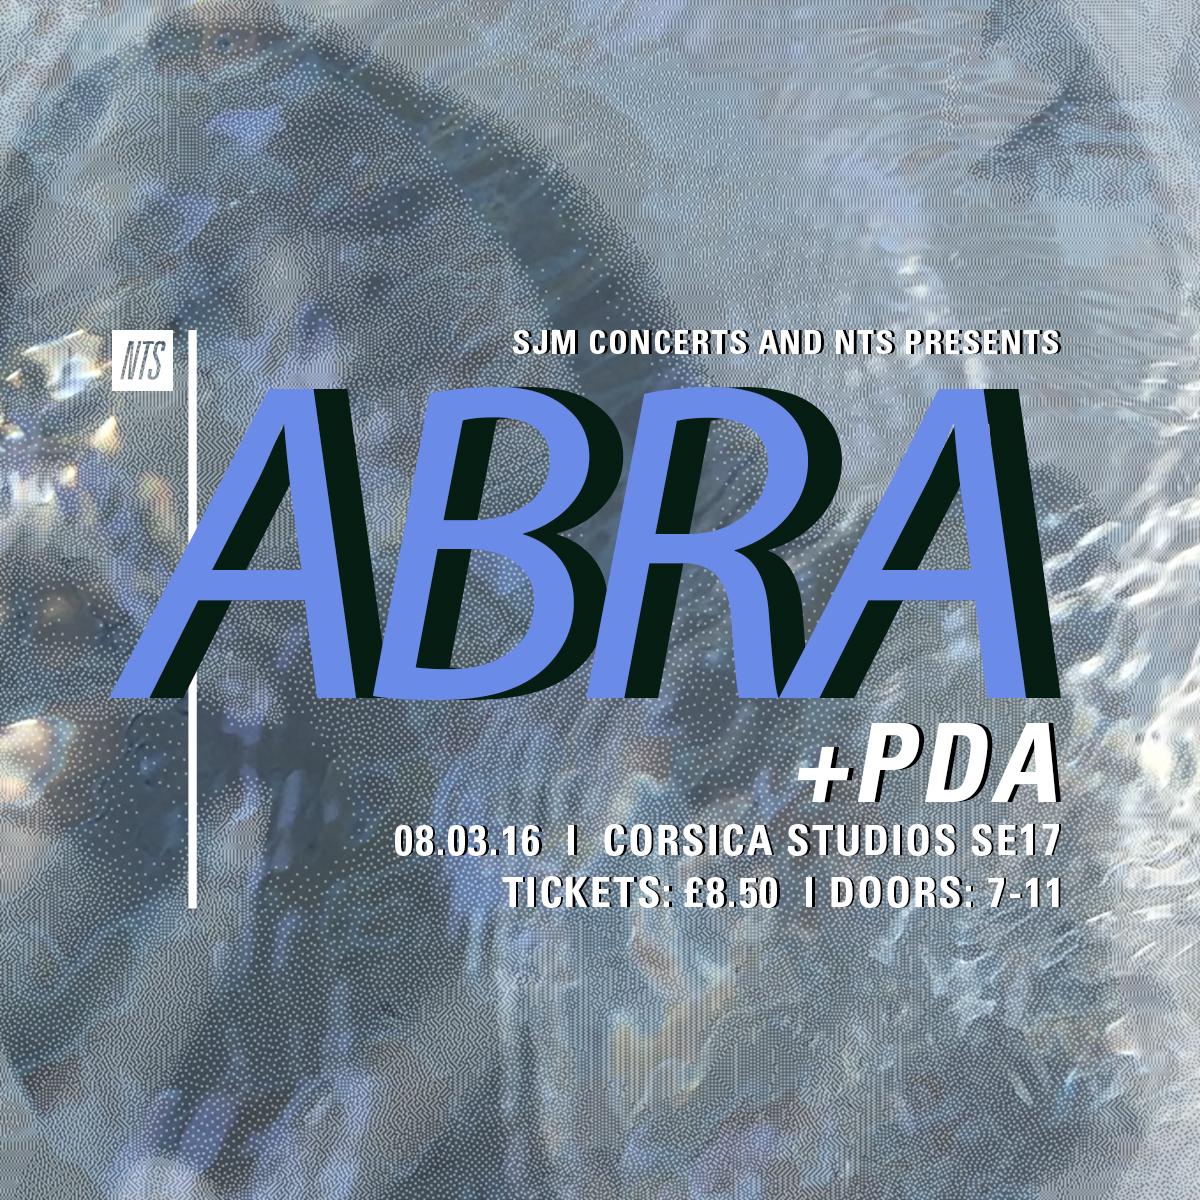 ABRA-LIVE-NTS-ARTWORK-1200x1200.jpg